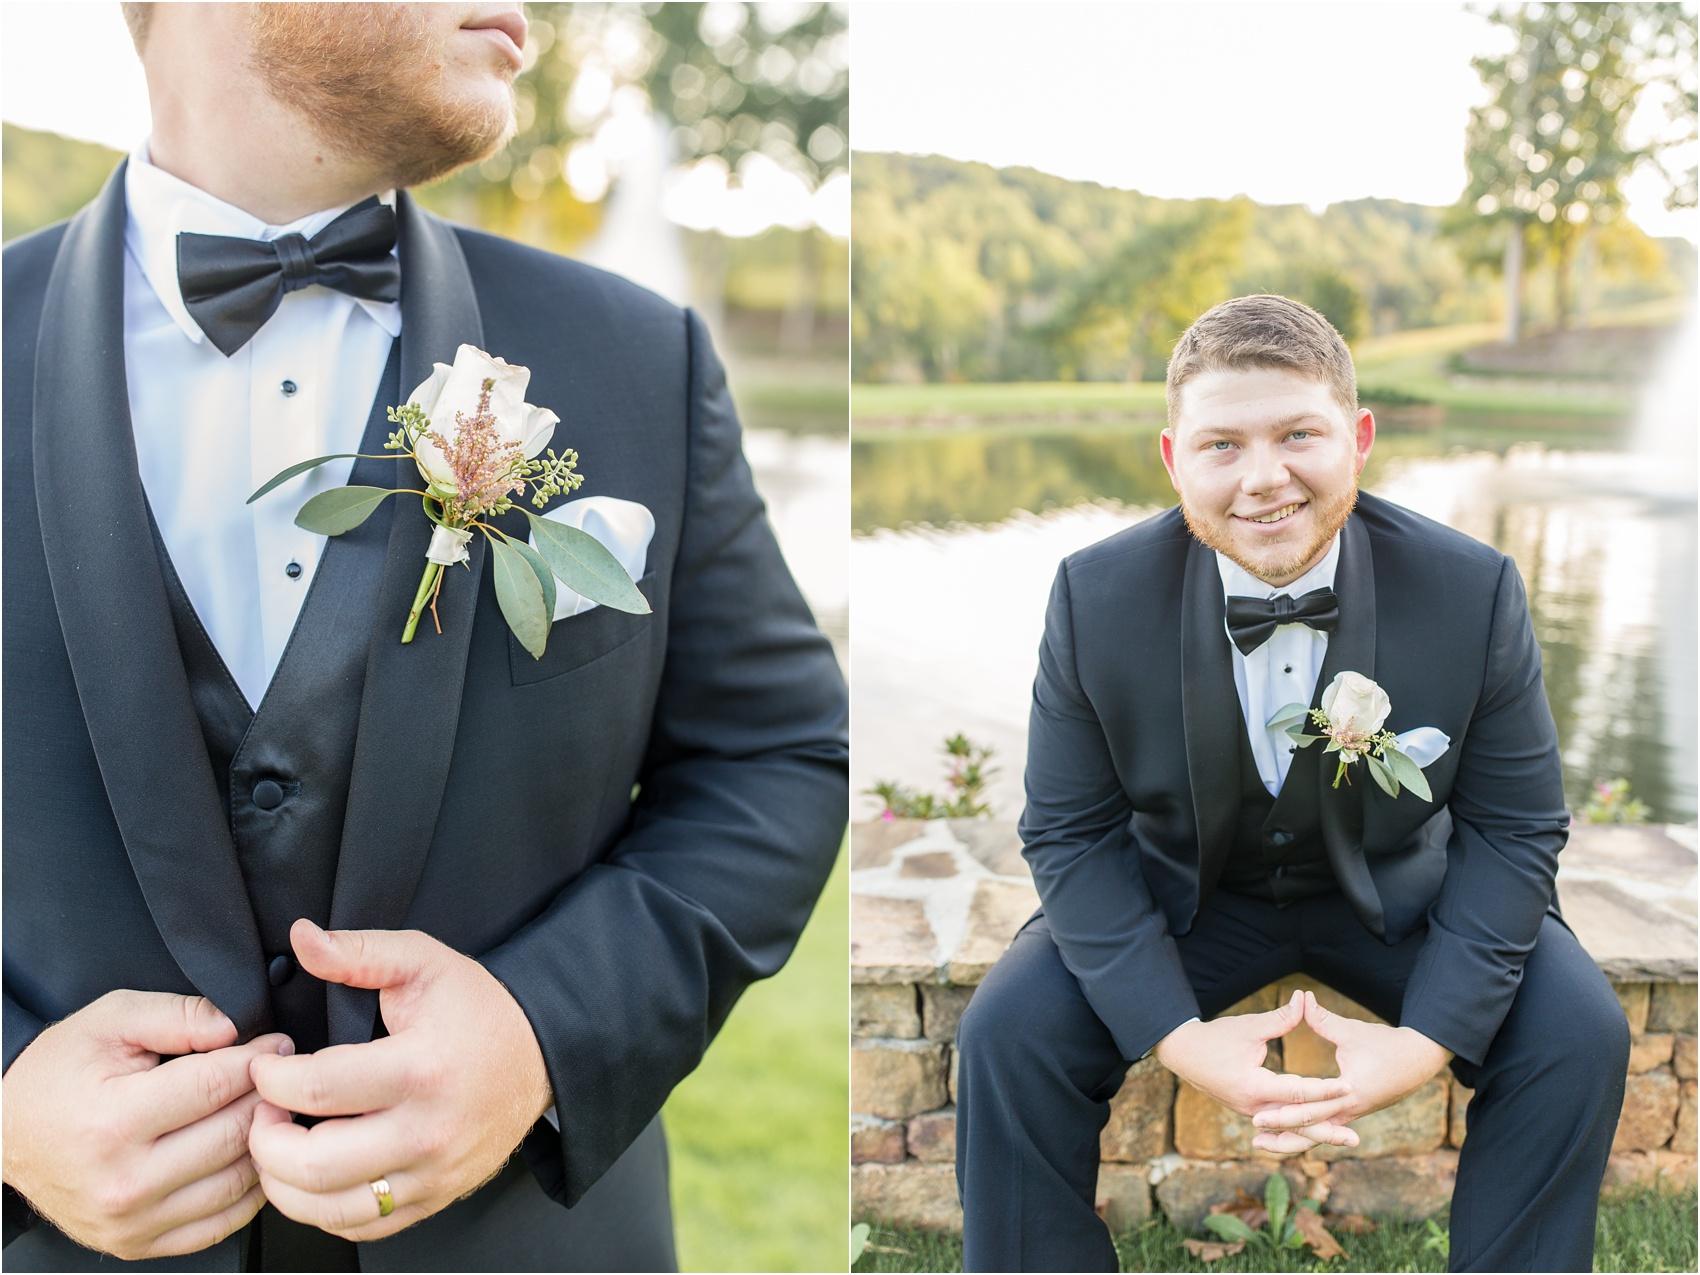 Savannah Eve Photography- Jurek-Woodworth Wedding- Sneak Peek-76.jpg